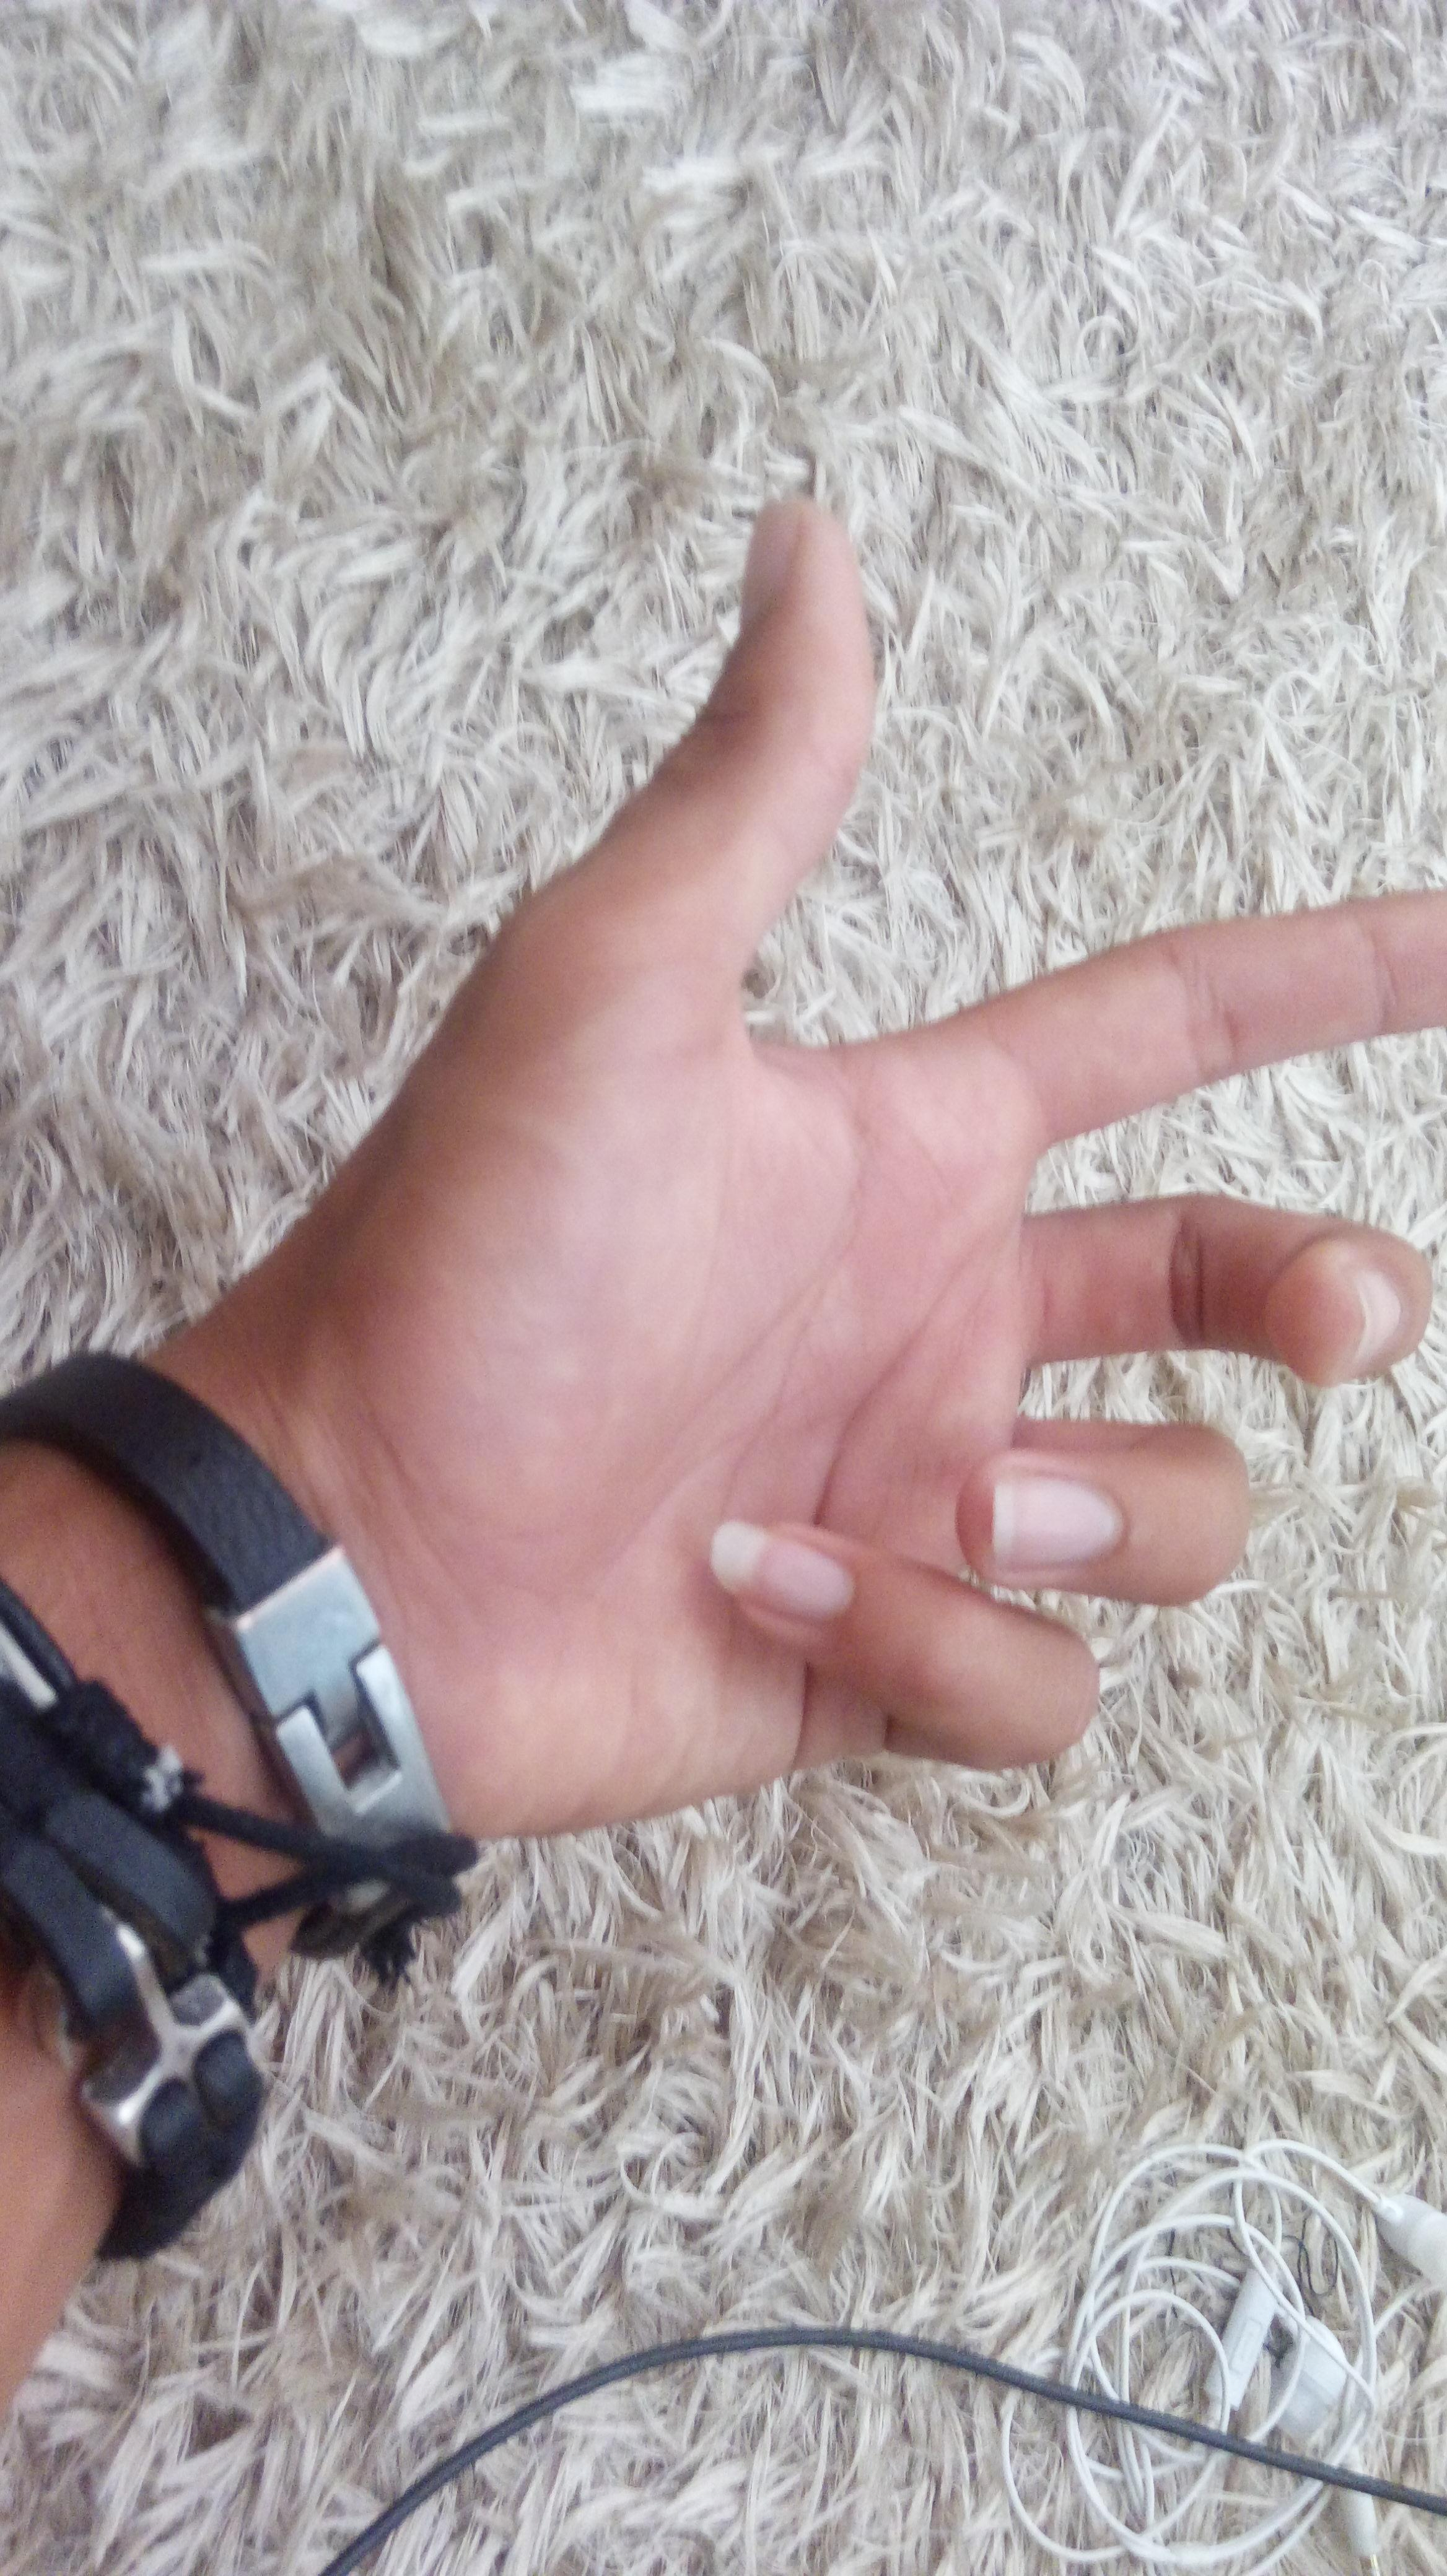 guzel erkek eli eli guzel olan erkegin